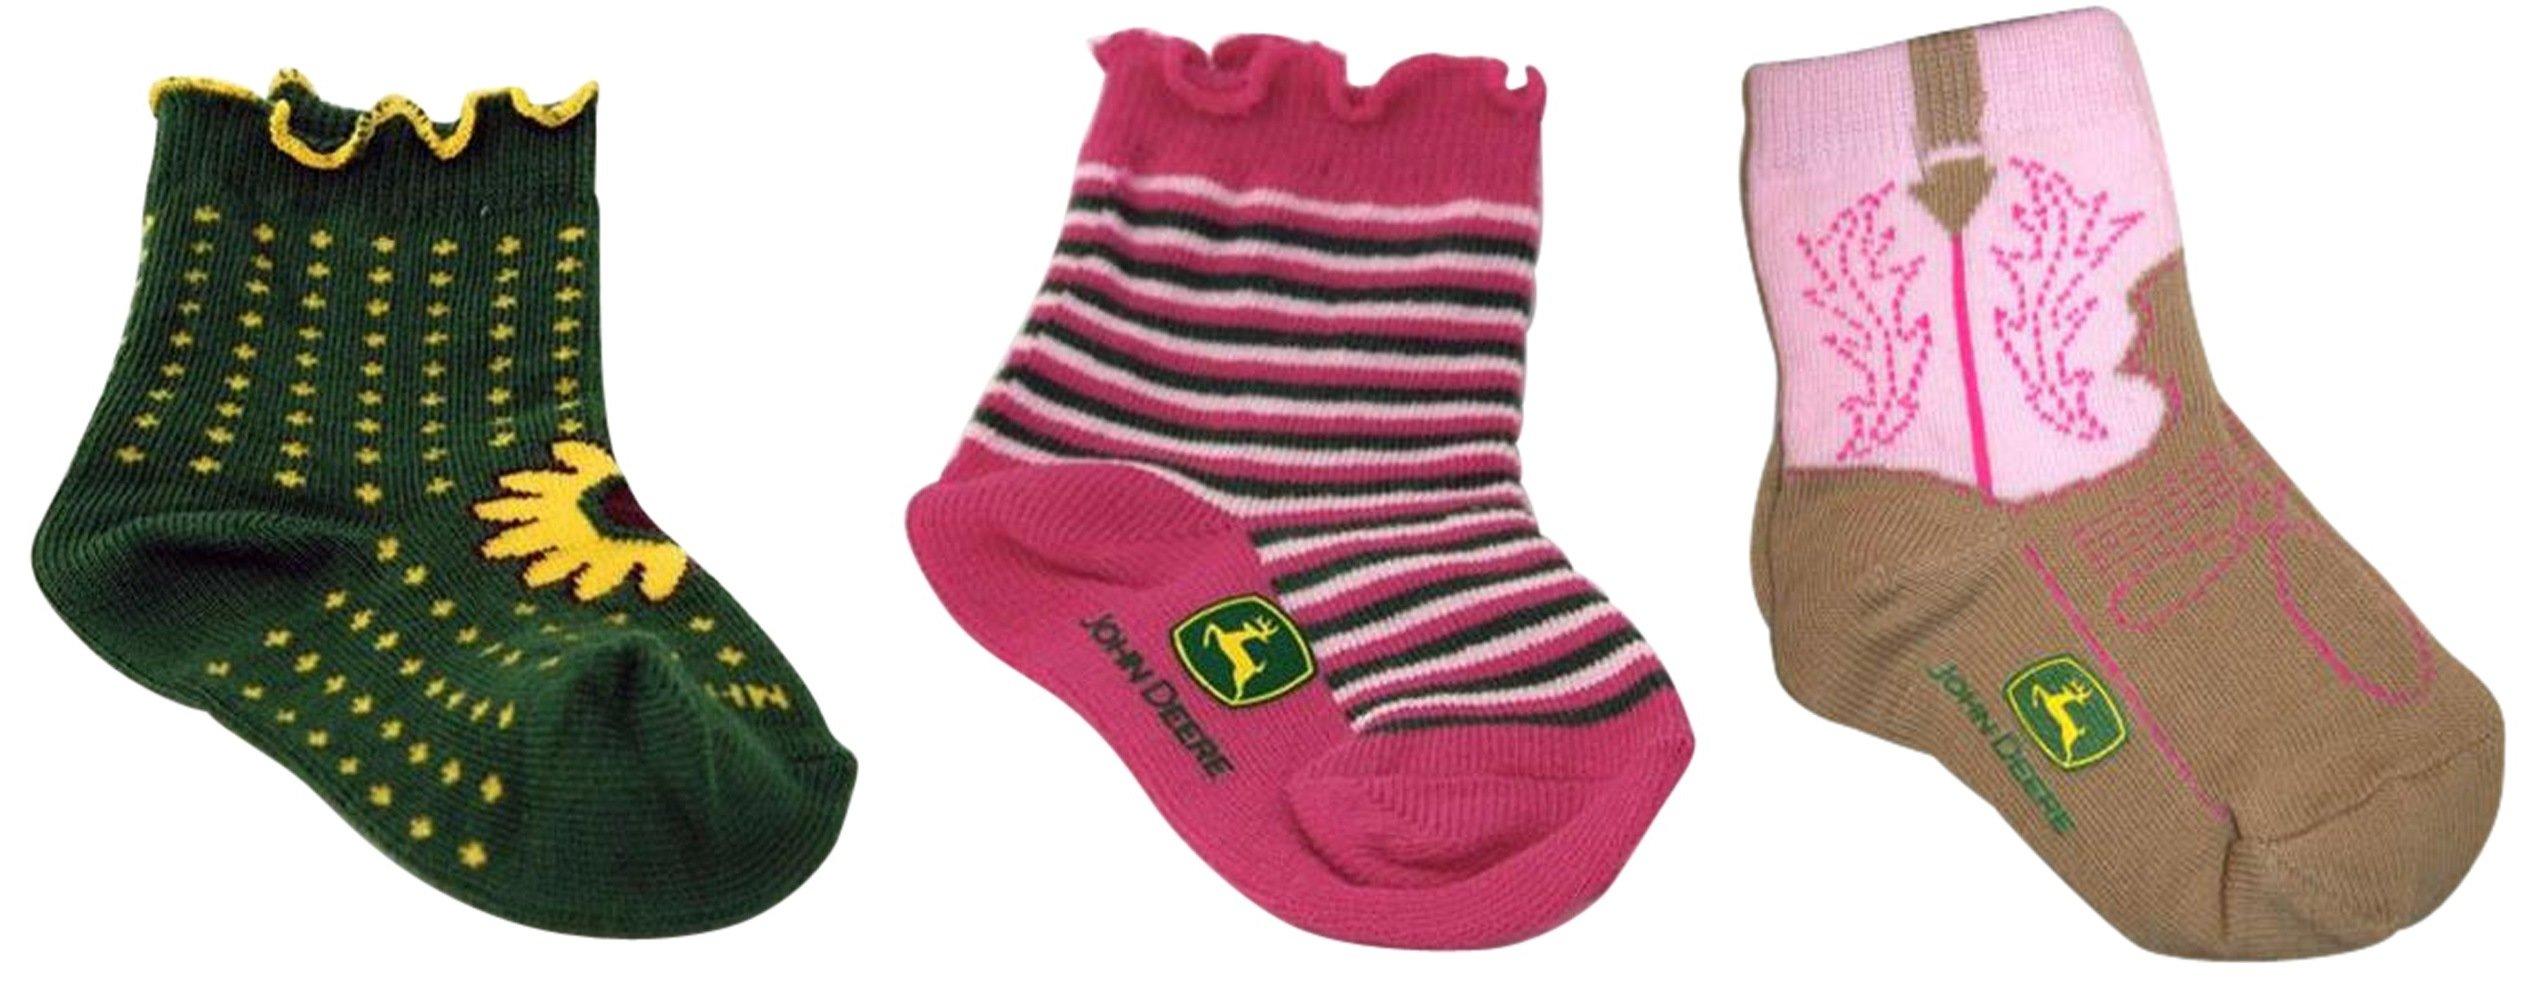 John Deere Girls Sunflower - Multistripe - Pink Boot - 3 Pair Sock Bundle 12-24 months